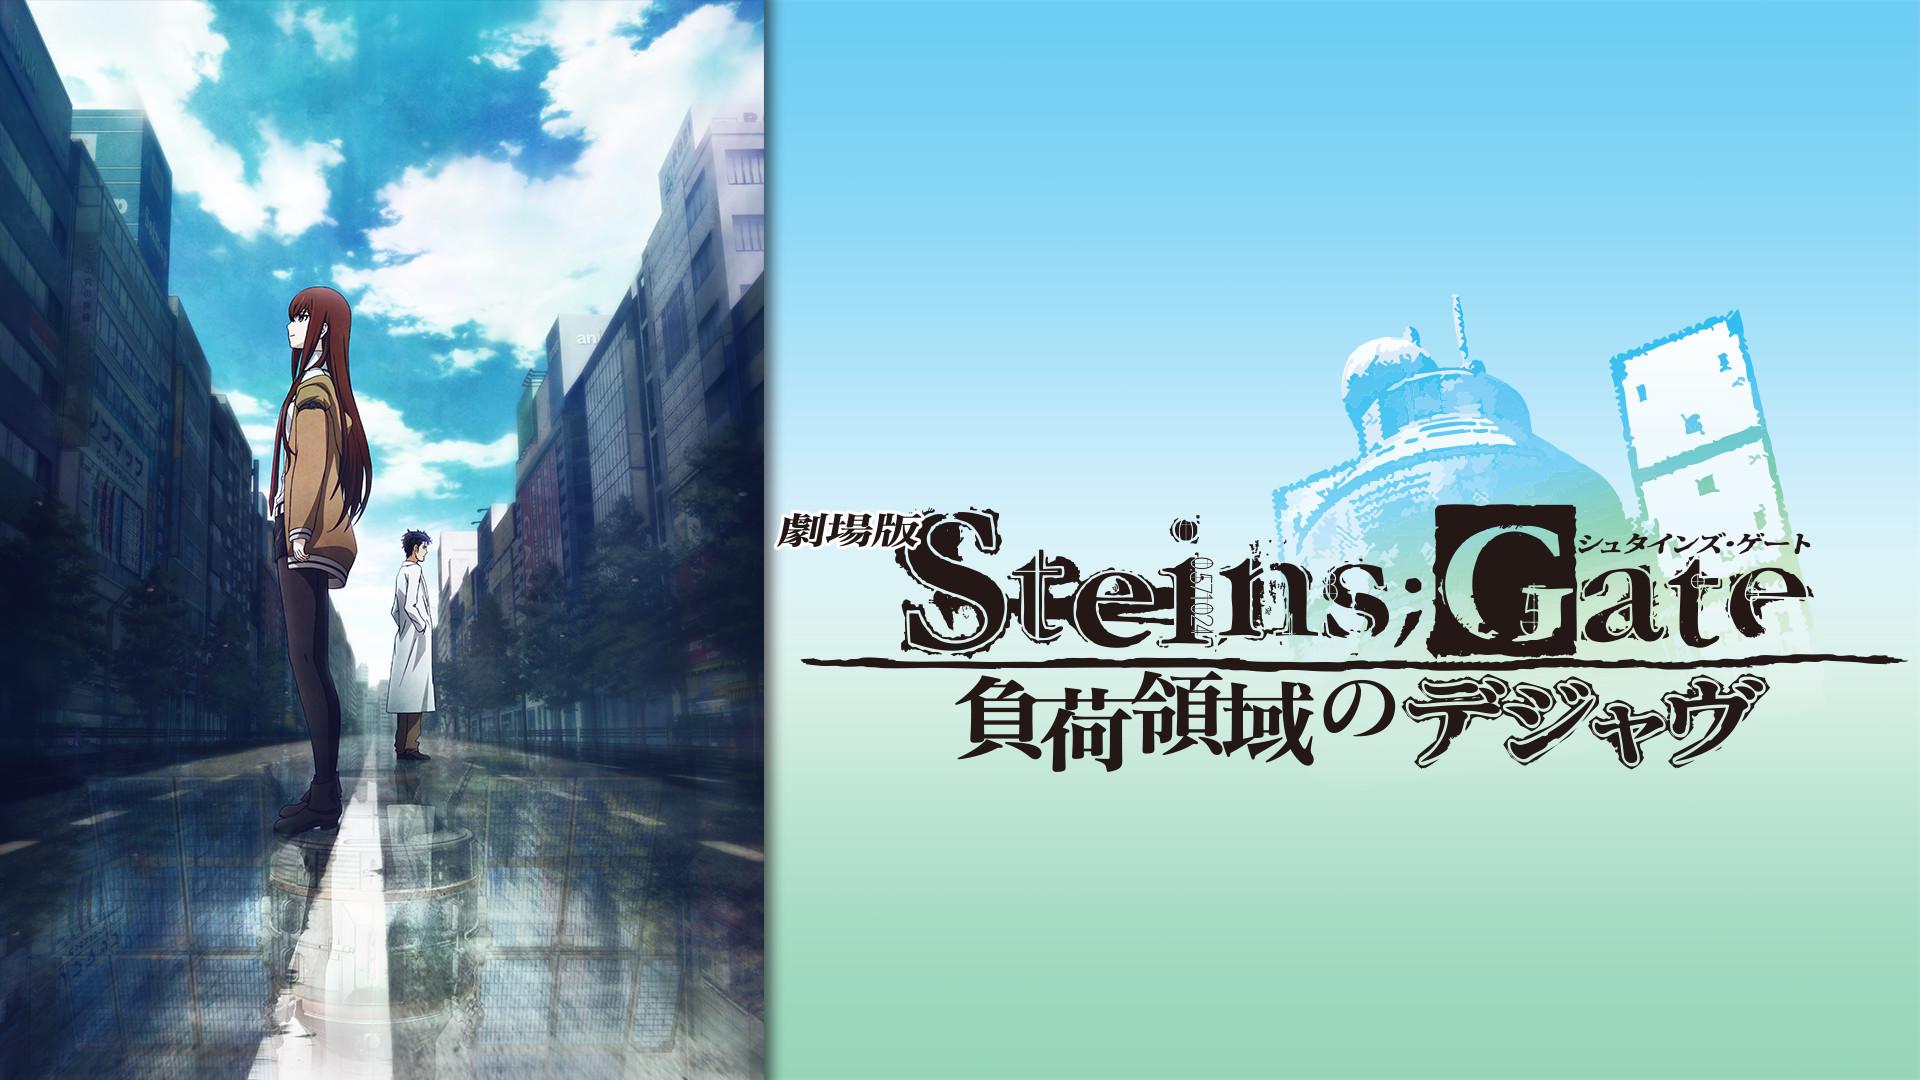 STEINS;GATE (アニメ)の画像 p1_26